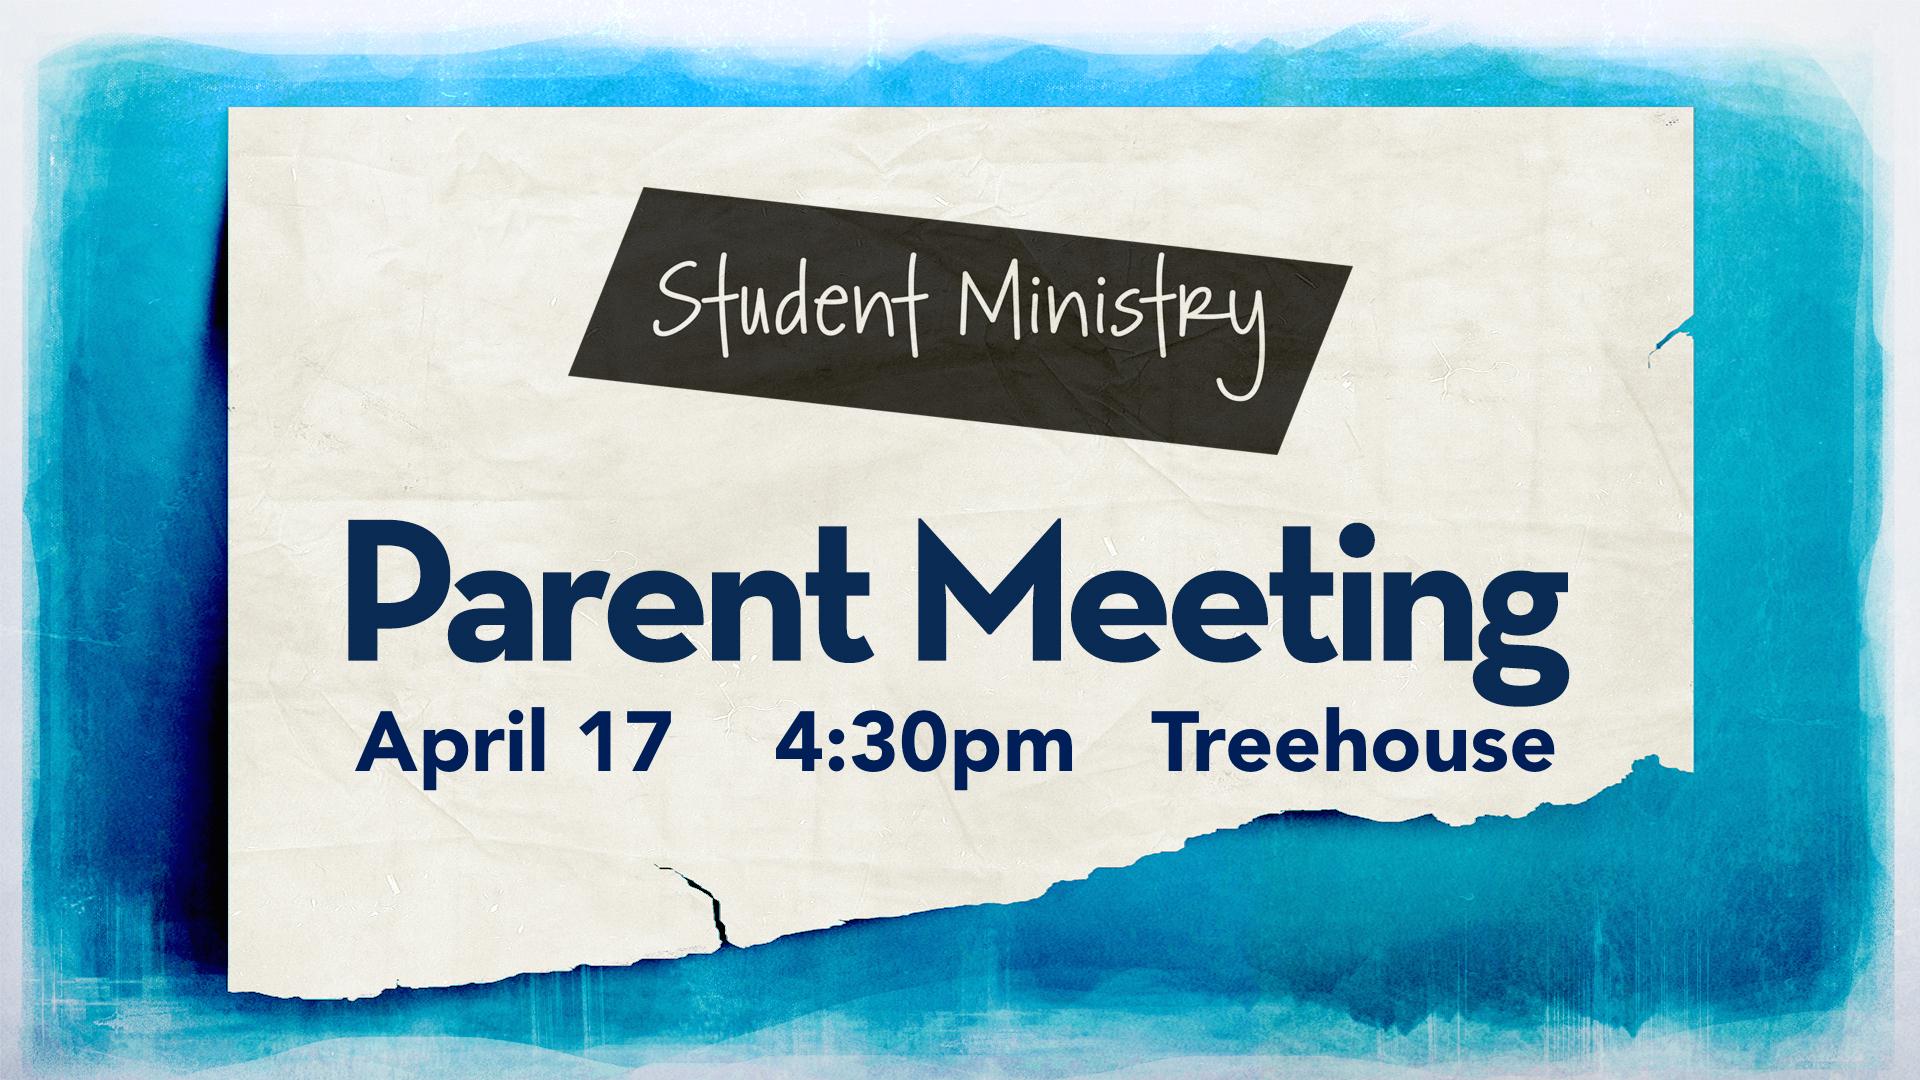 Parent Meeting - The Talk - April 17 @ 4:30pm